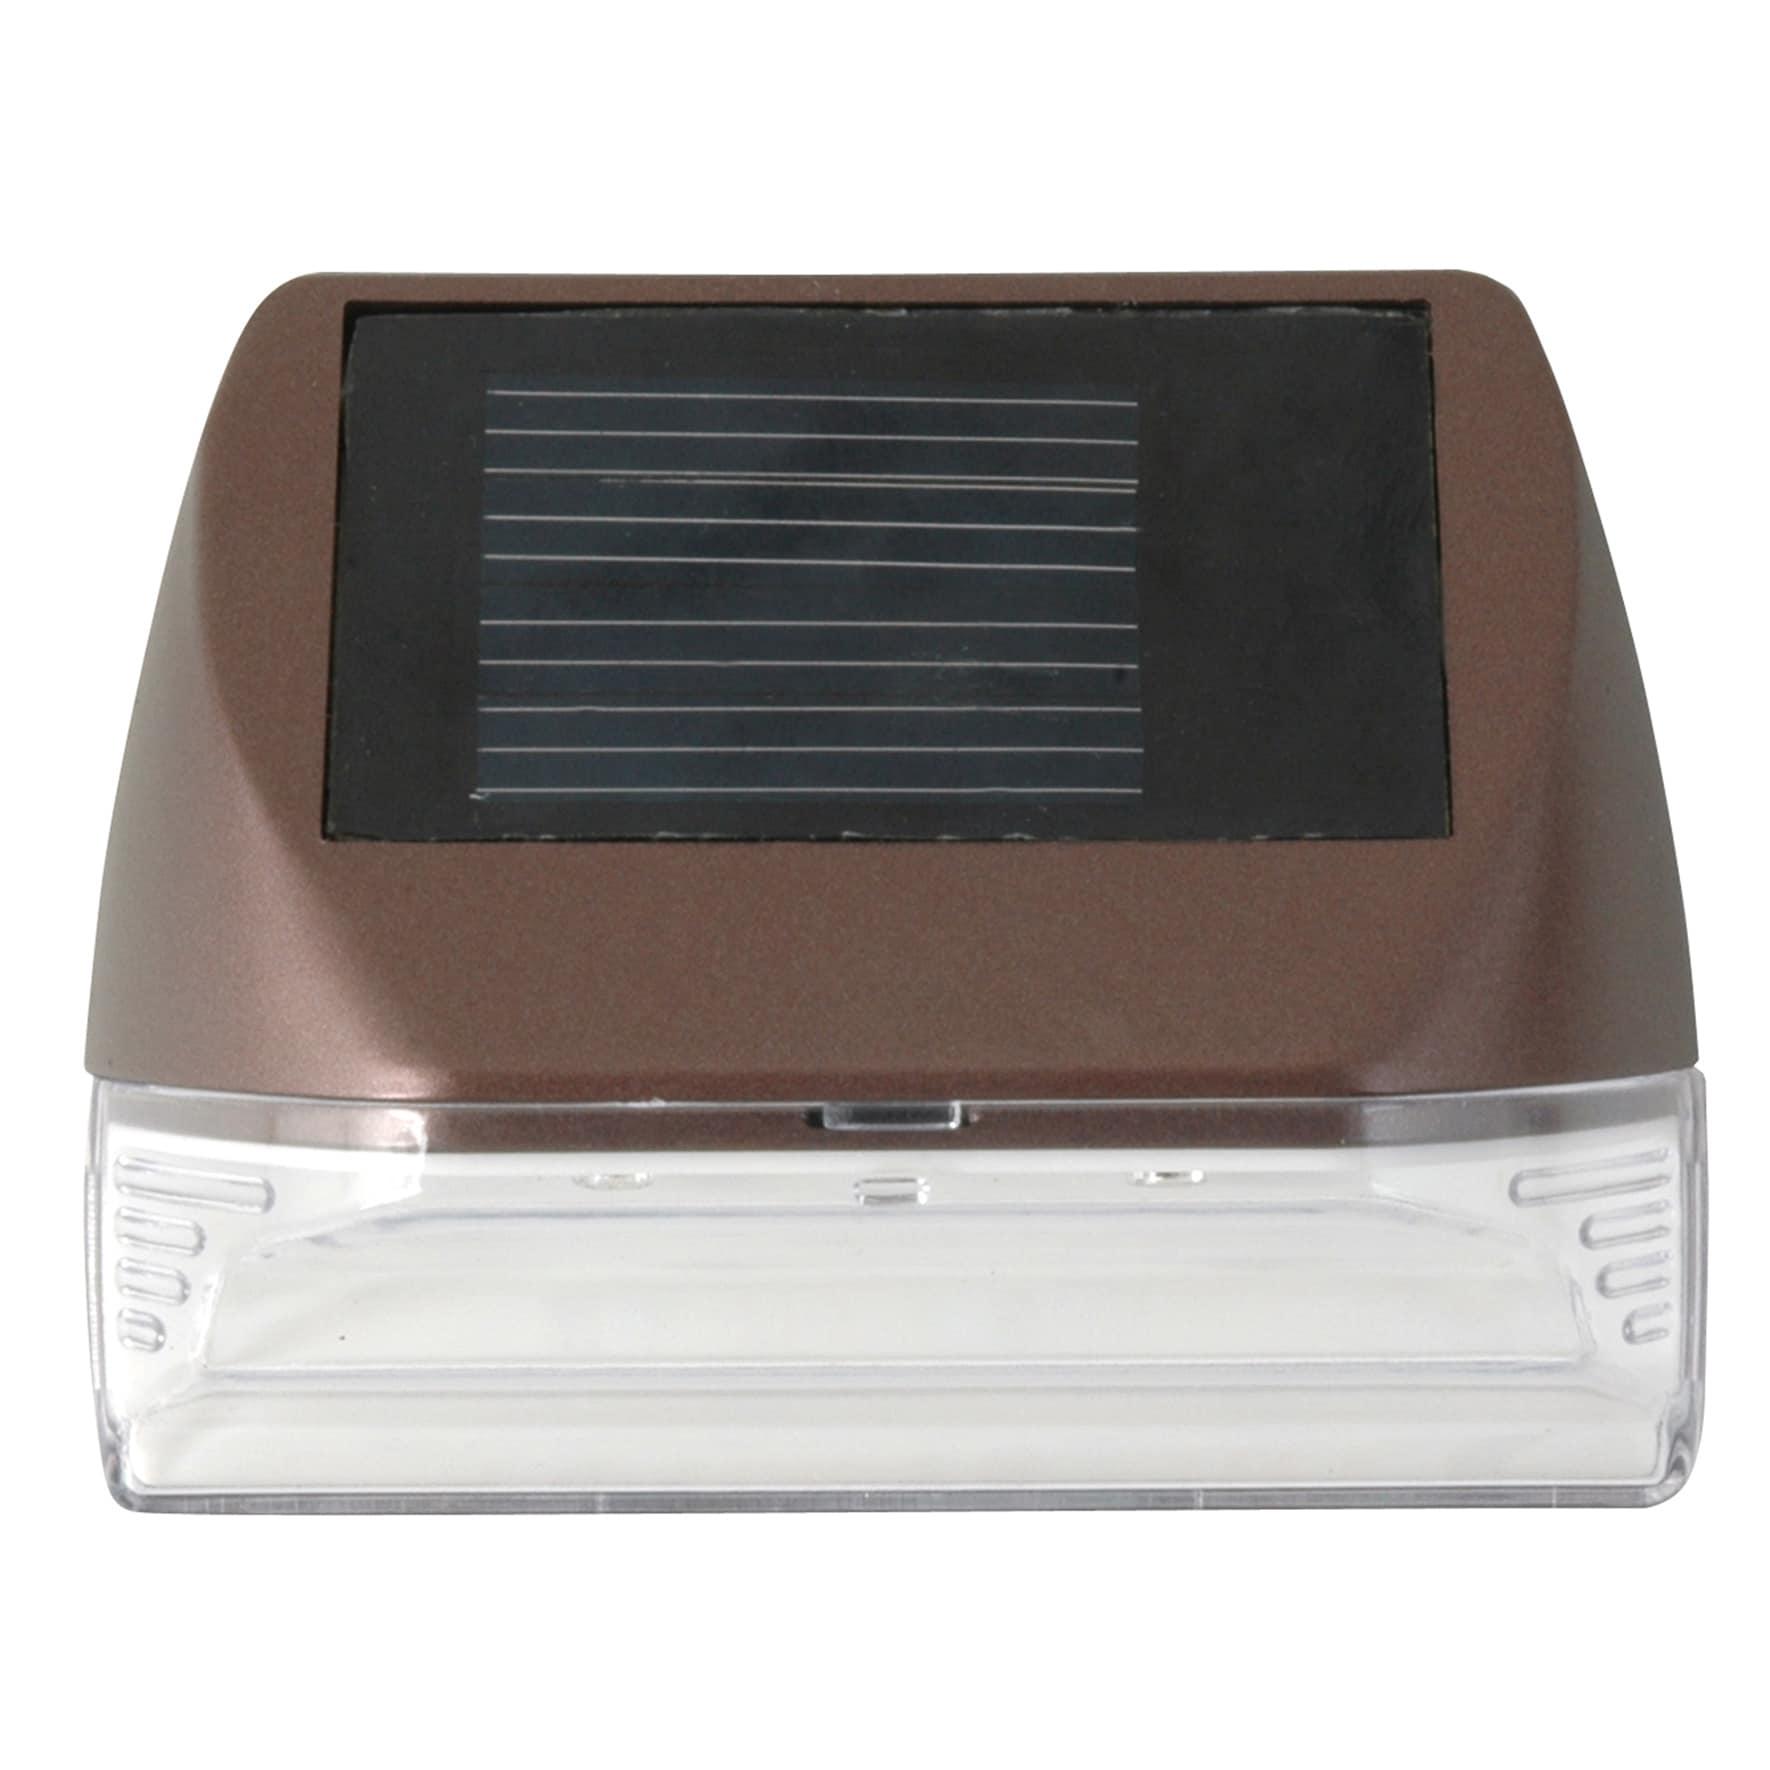 Moonrays 95028 Mini Deck Light On Card (Outdoor lighting)...